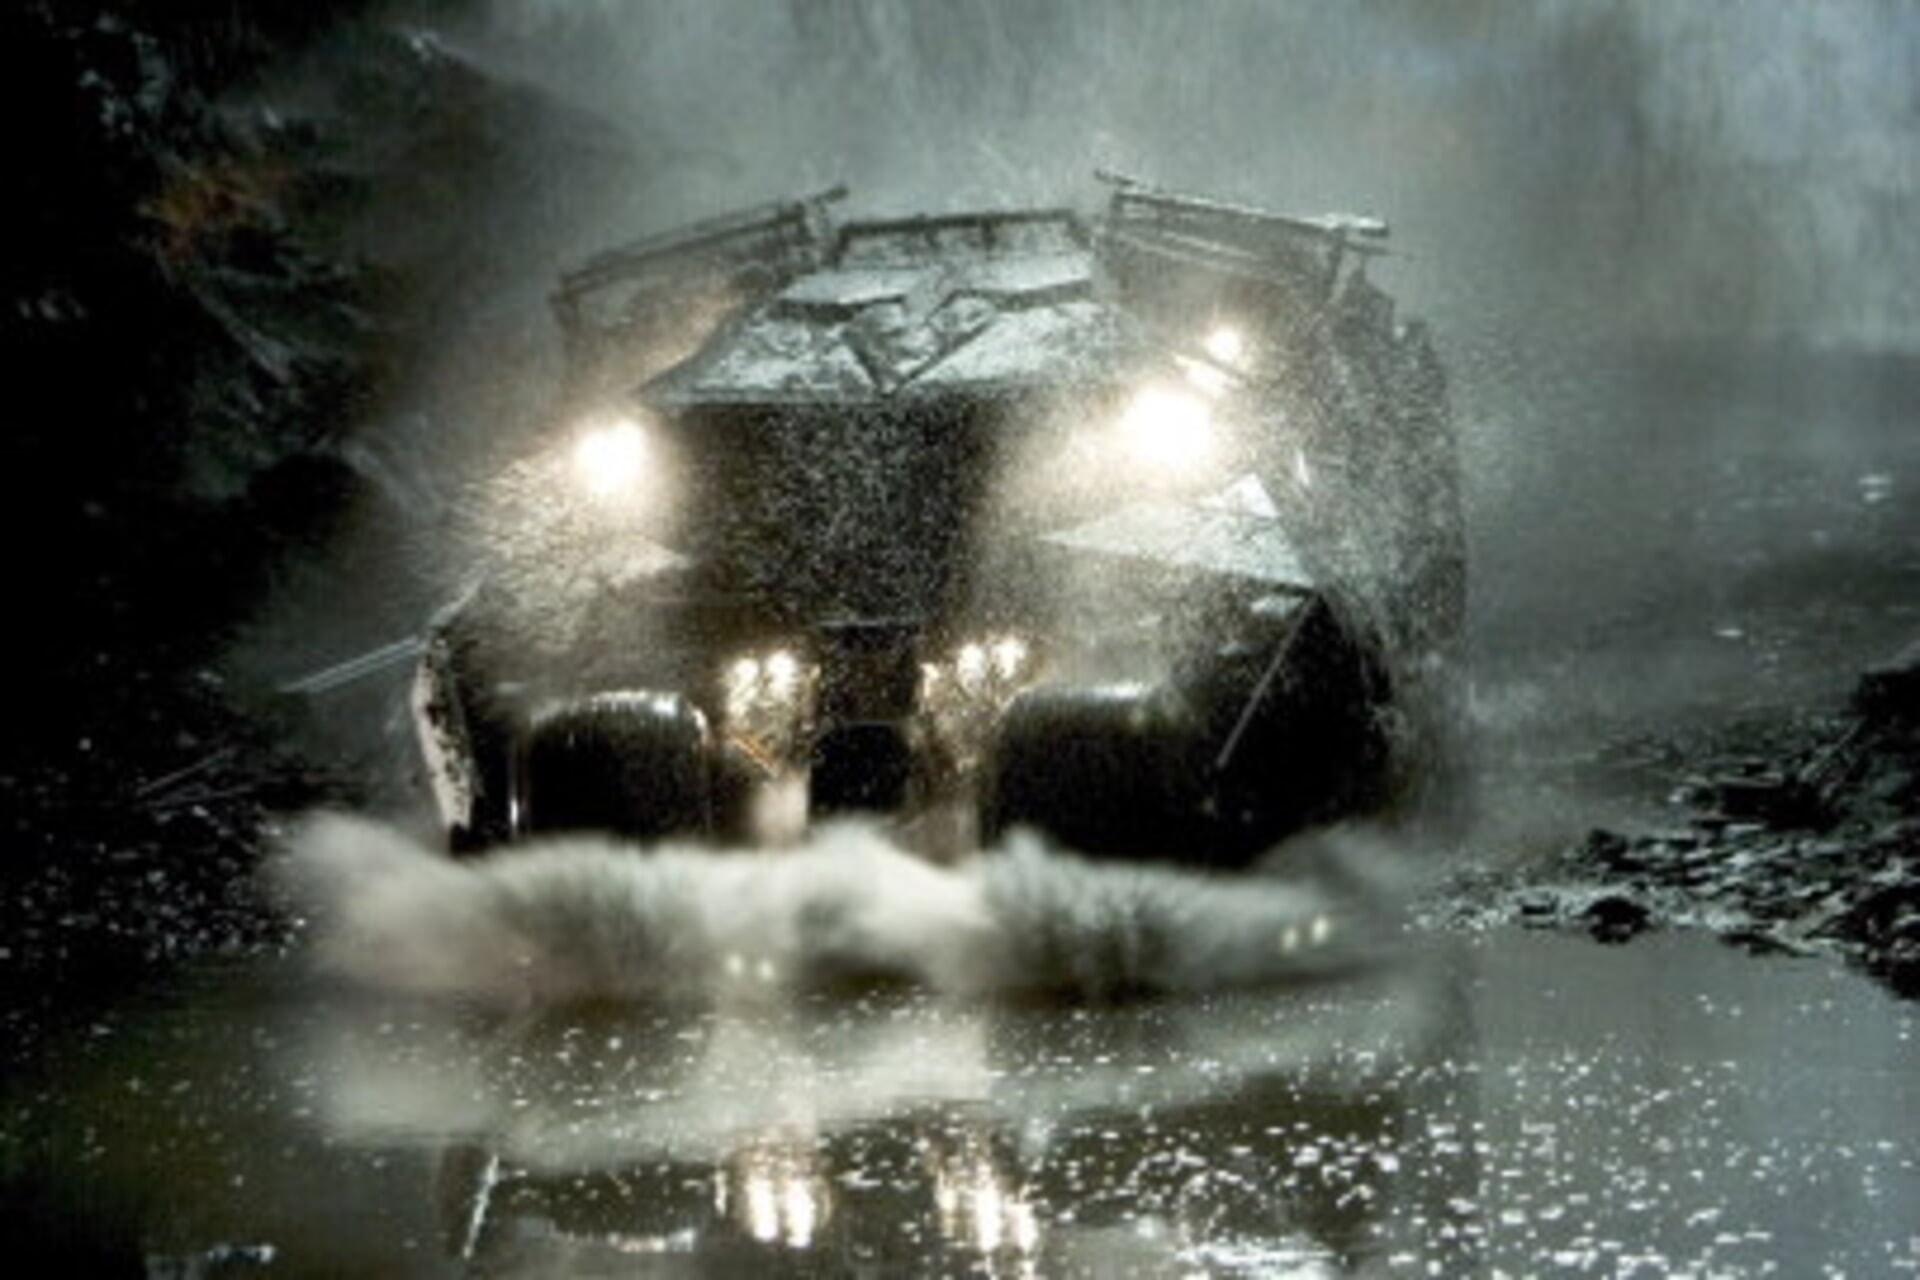 Batman Begins - Image 1